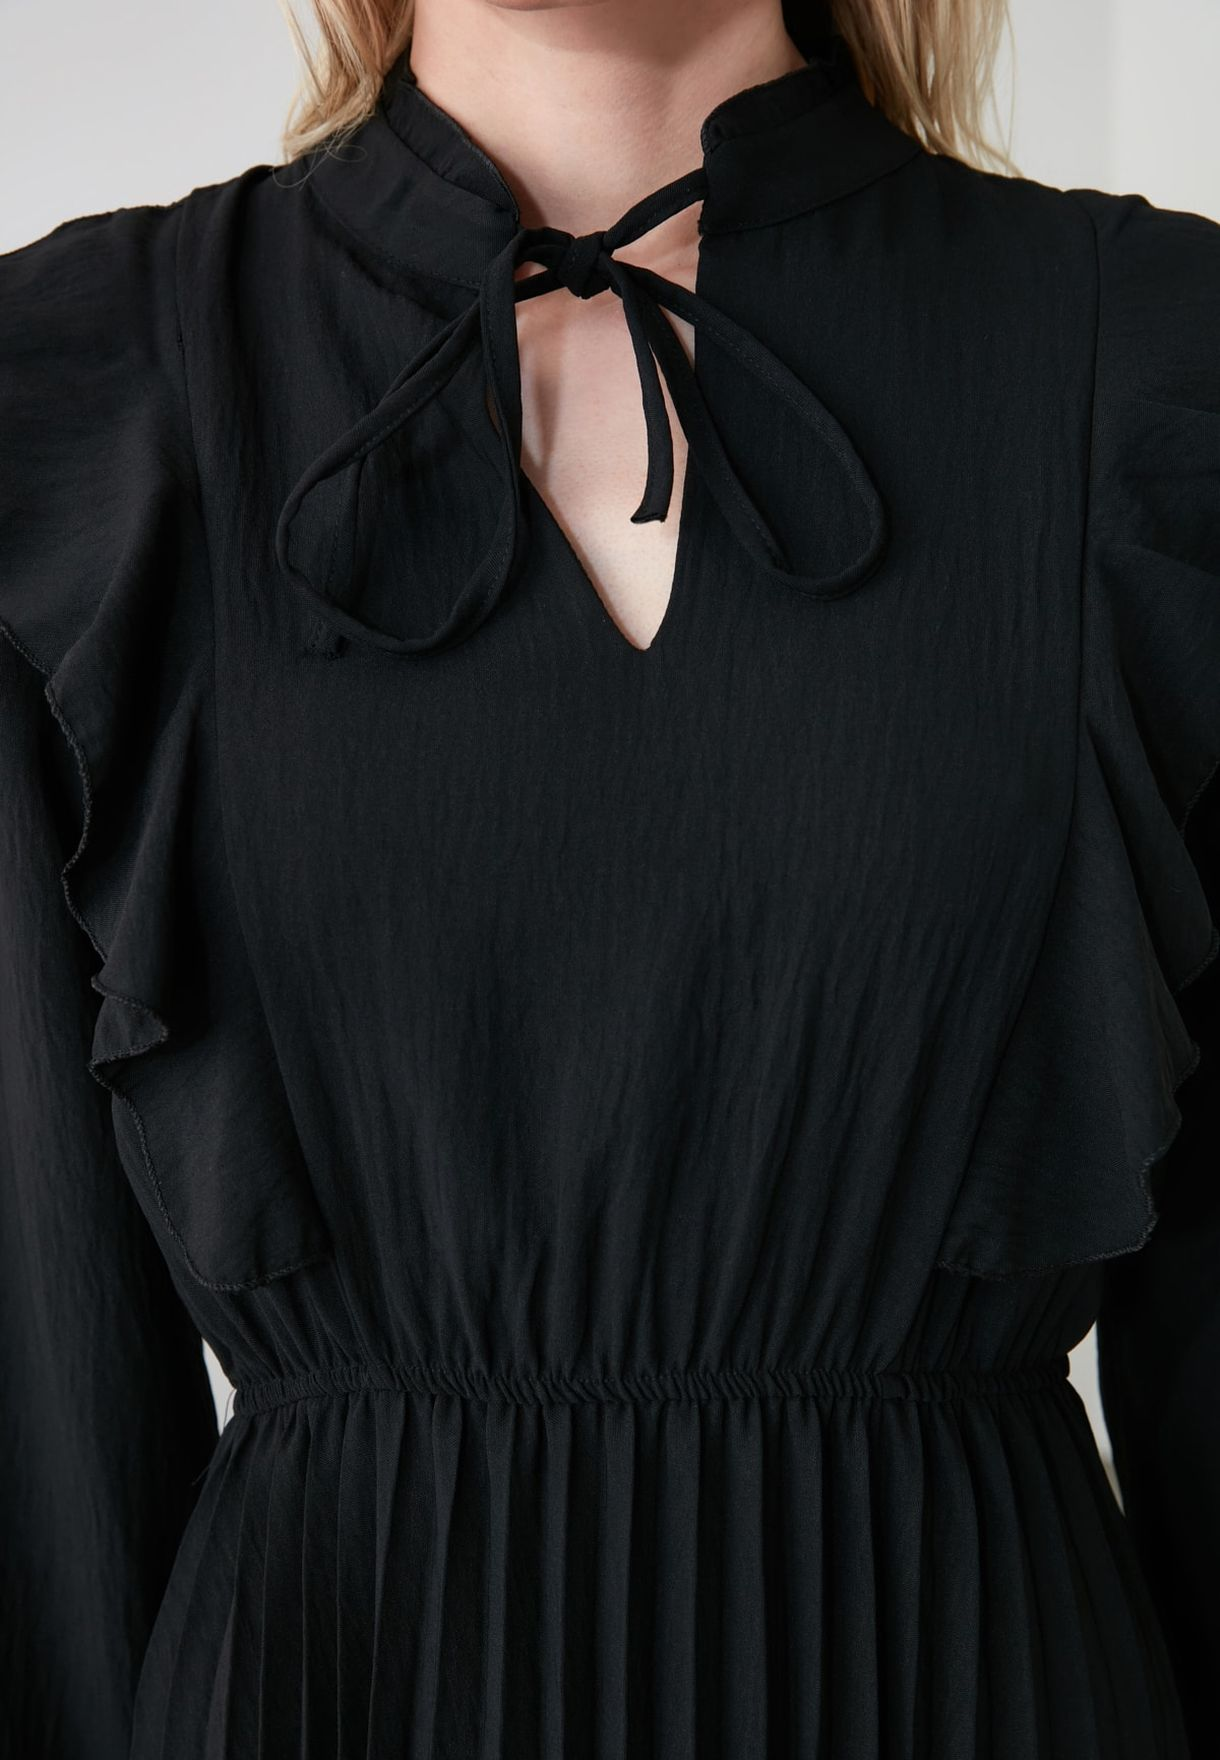 Pleated Choker Neck Dress